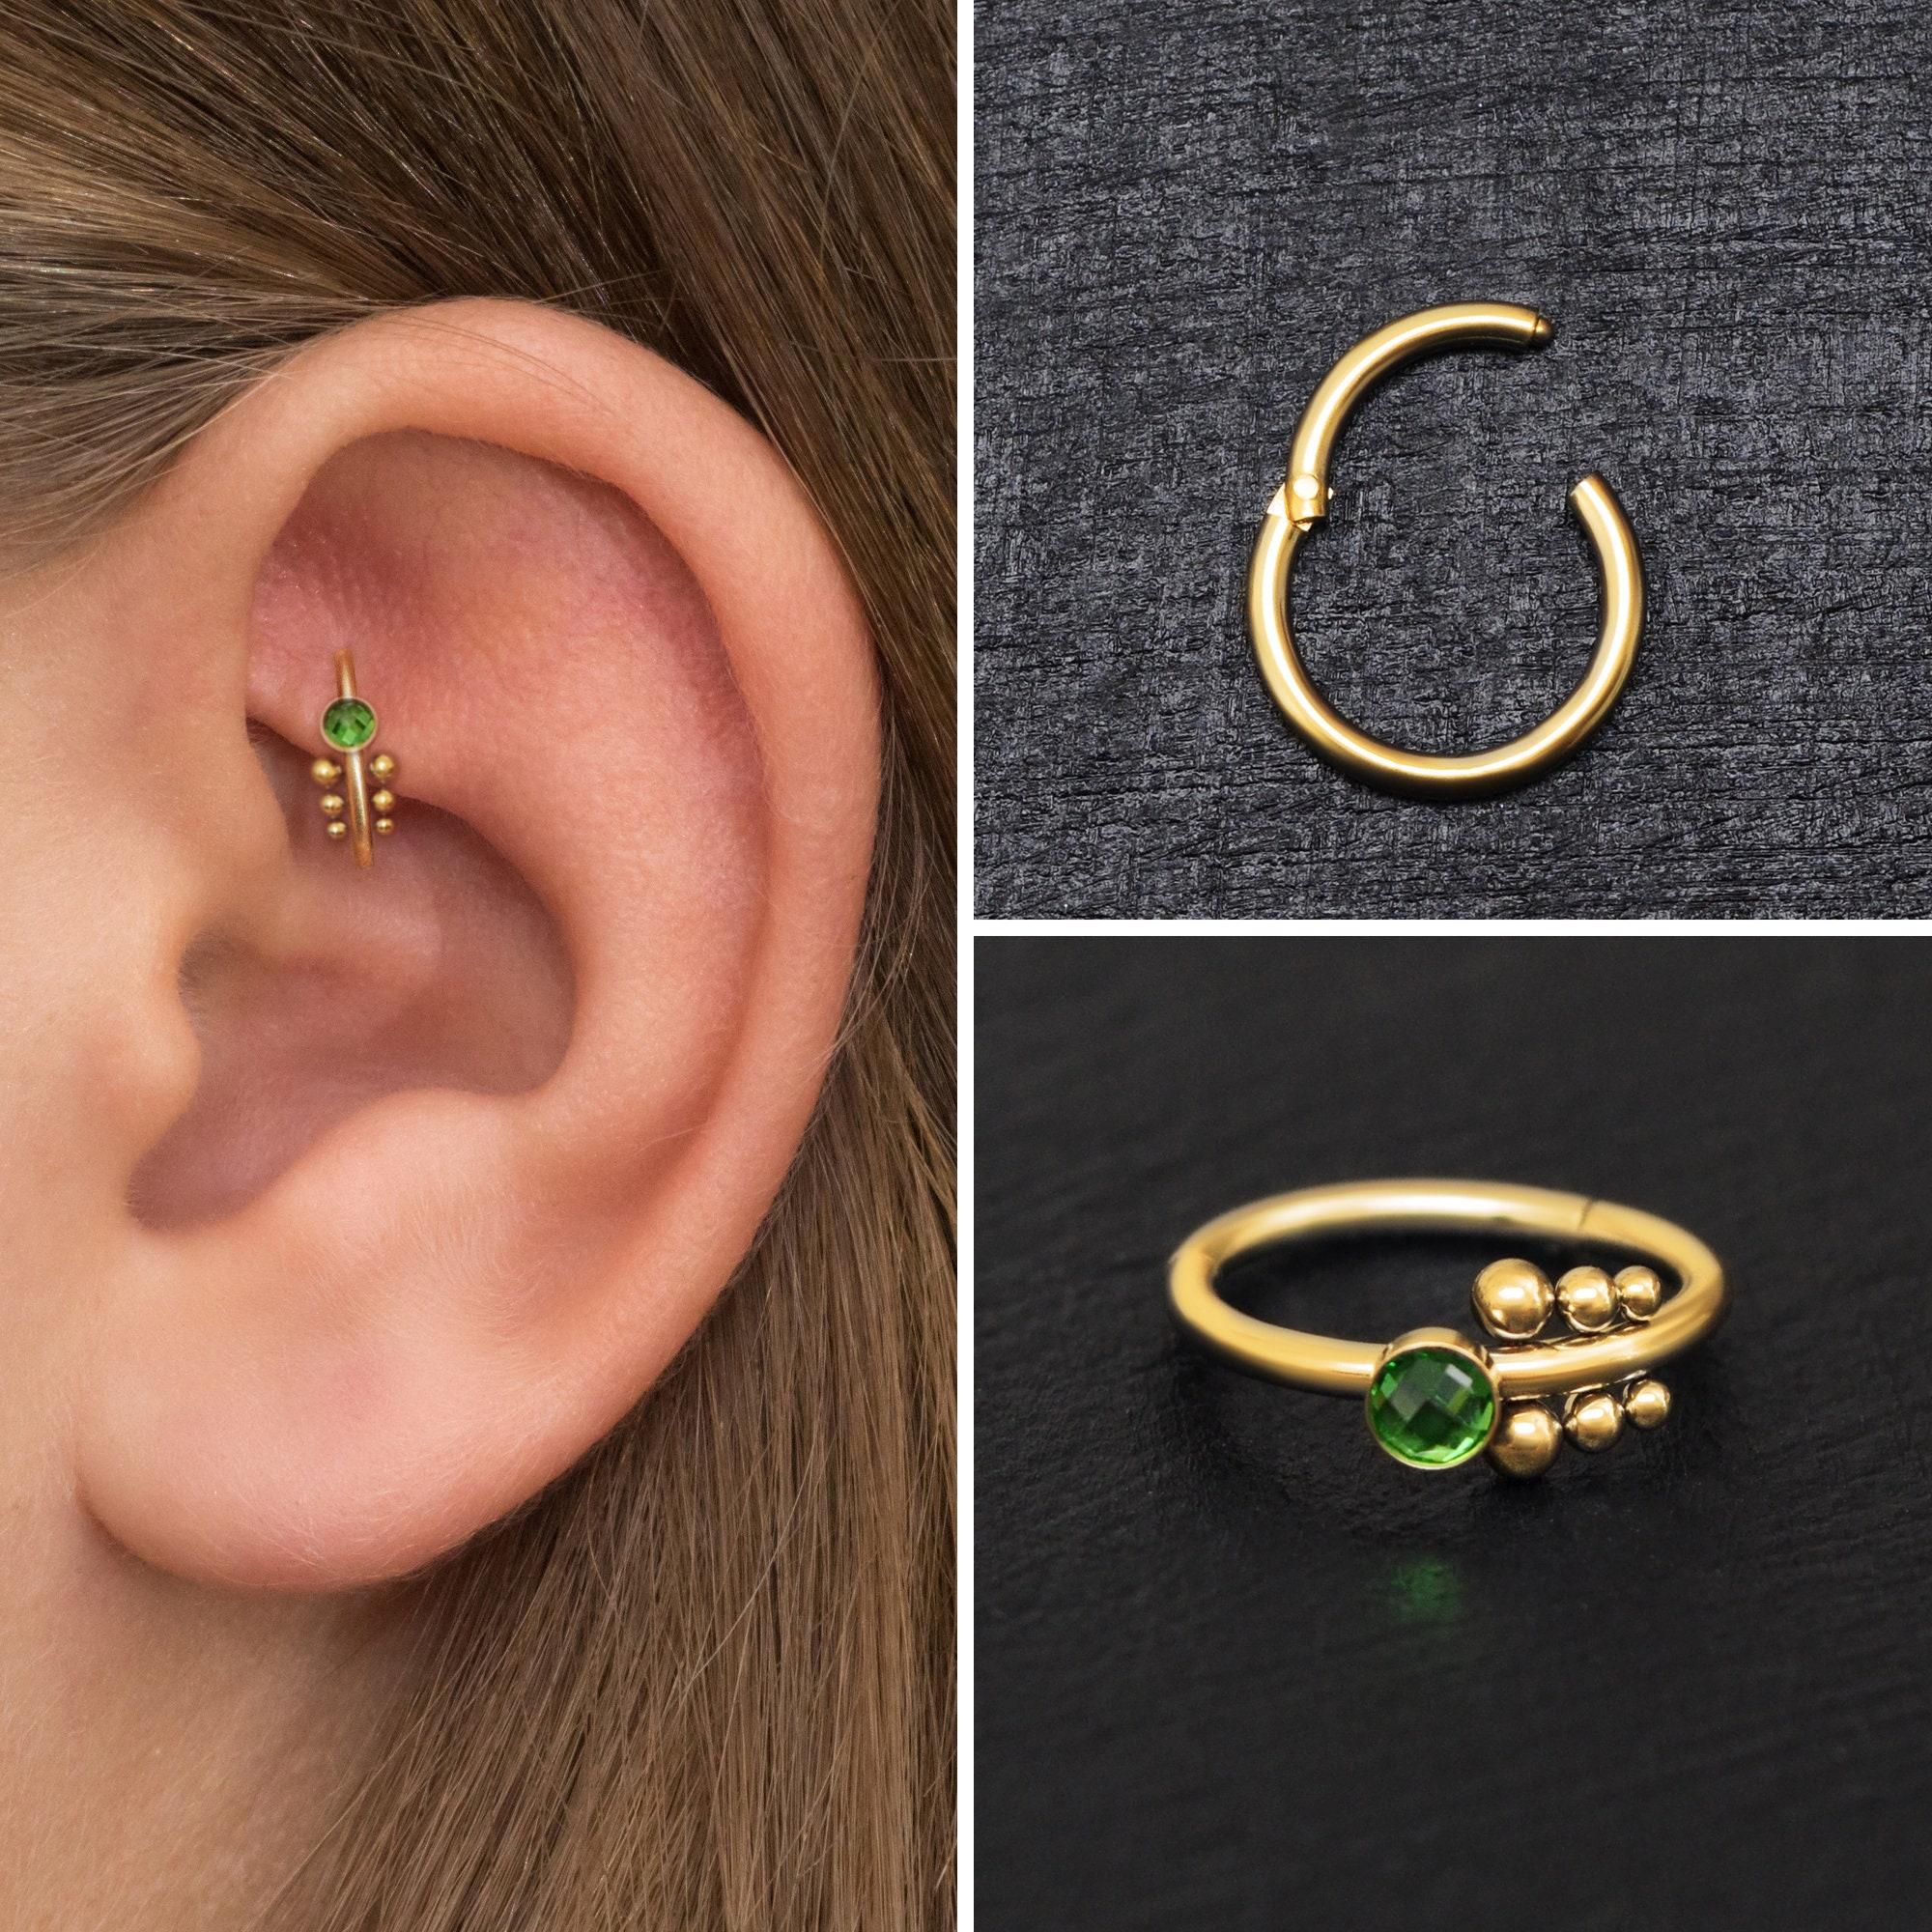 Surgical Steel Tragus Earring Hoop Forward Helix Piercing Opal Cartilage Piercing Rook Clicker Hoop Conch Piercing Rook Piercing